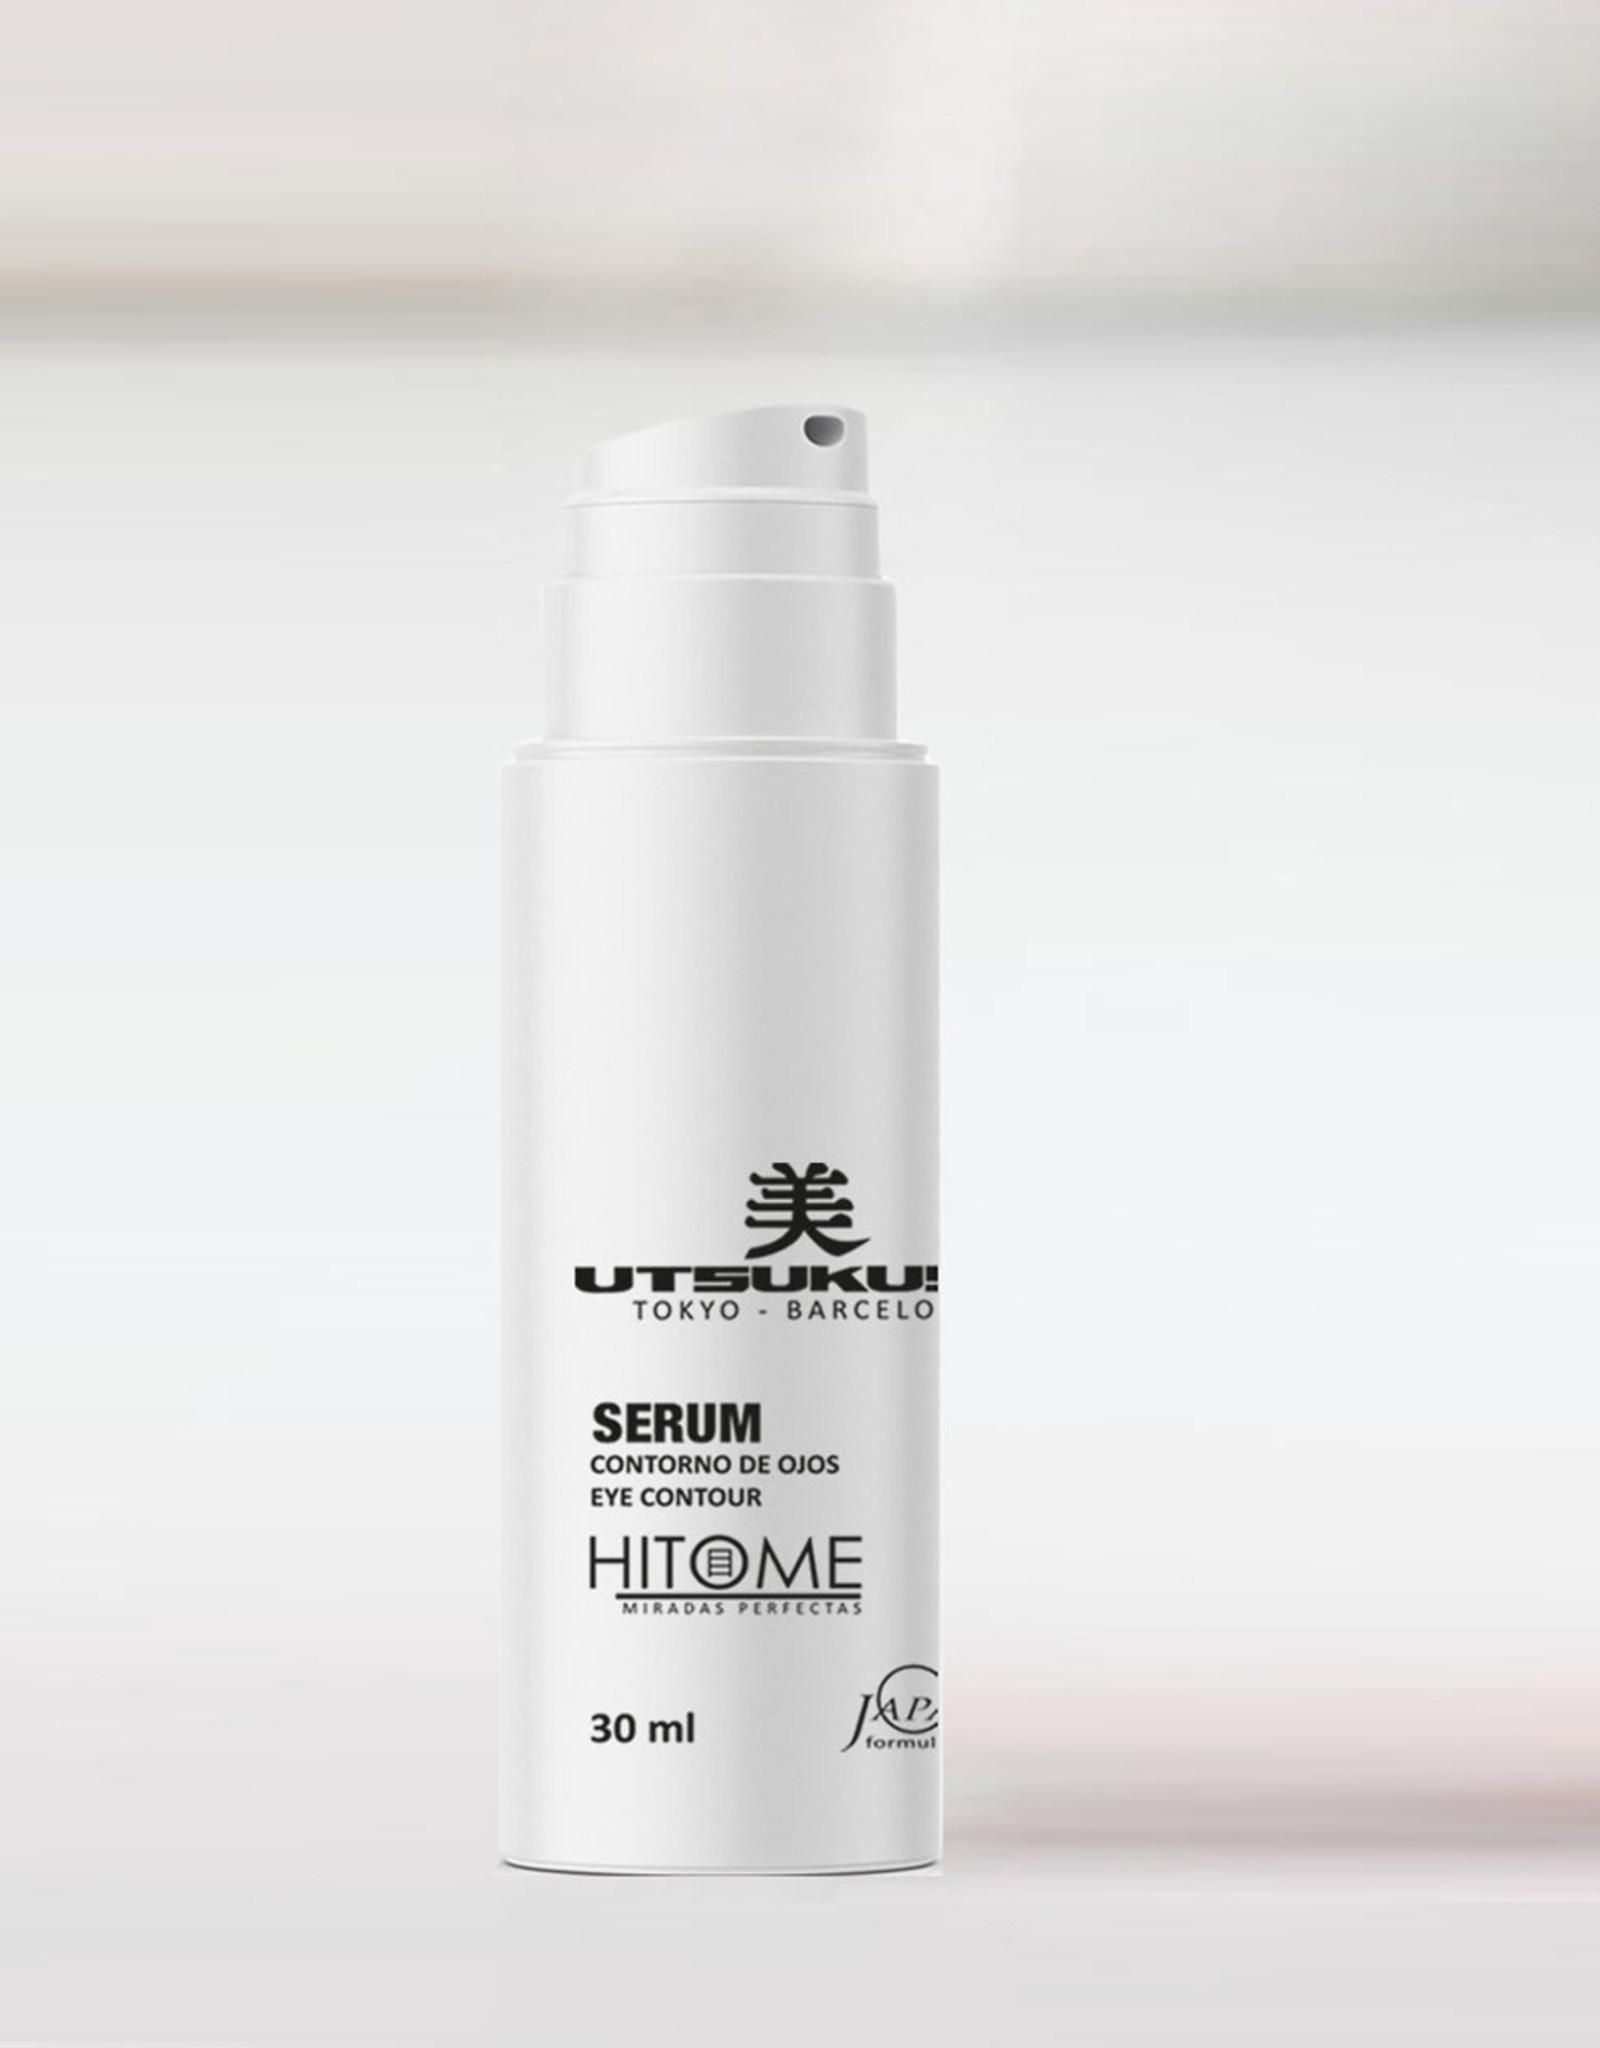 Utsukusy Hitome oog contour serum